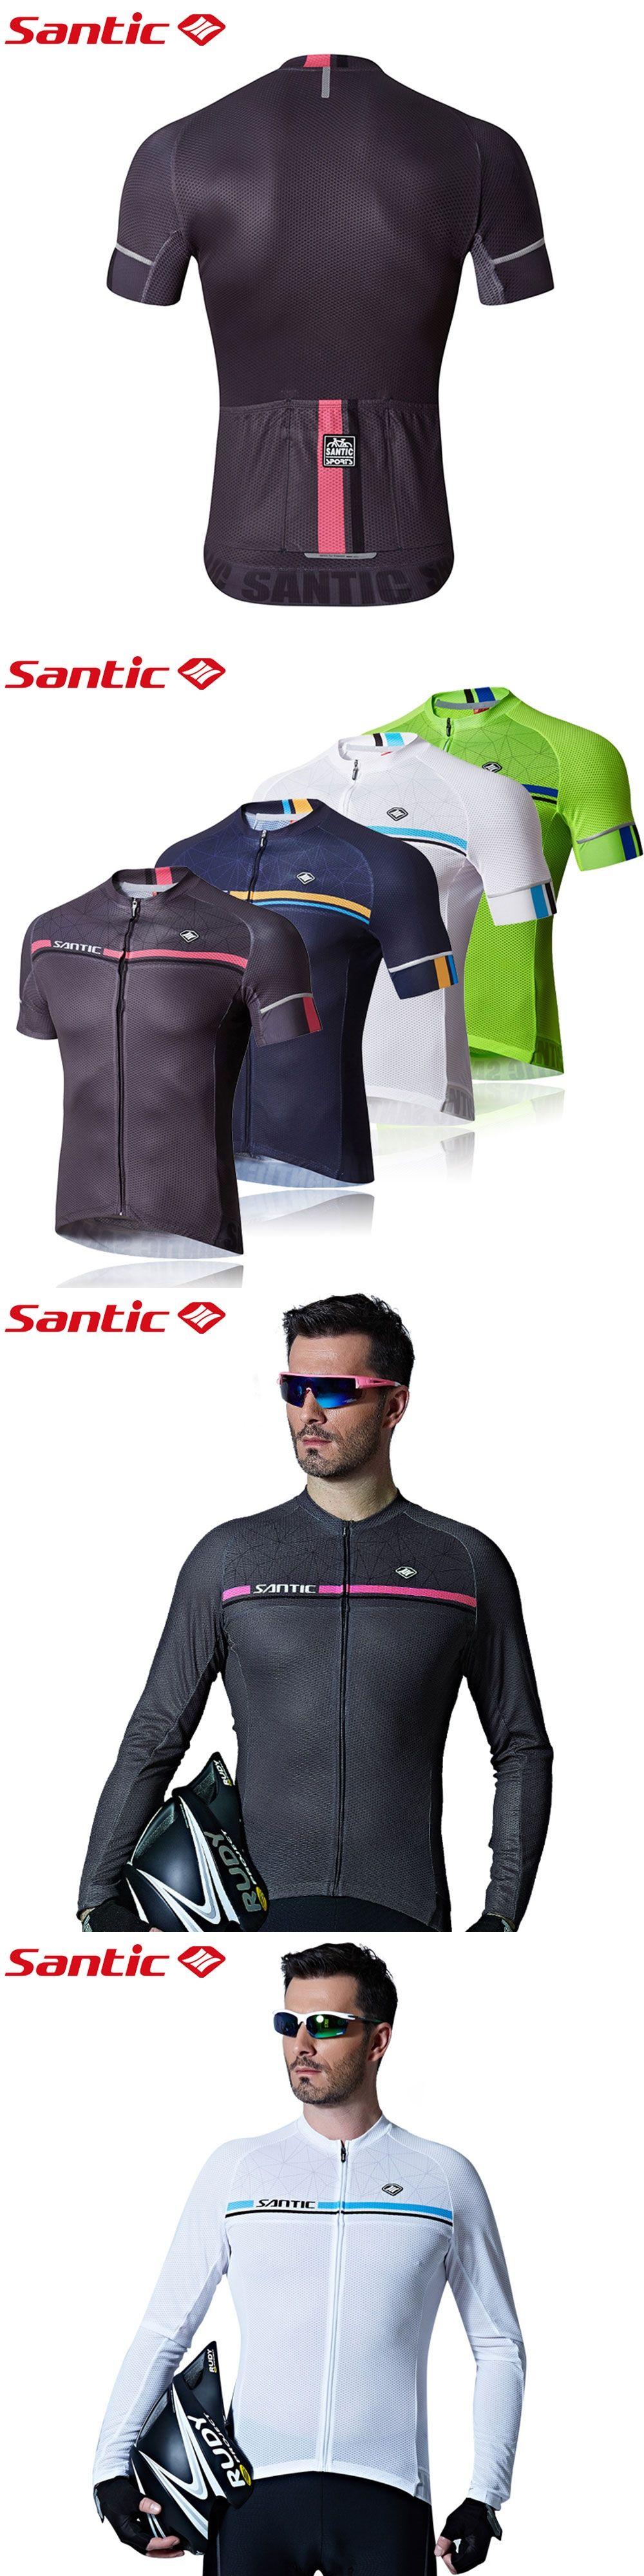 23fbee455 Santic Men Cycling Short Jersey Pro Fit Antislip Sleeve Cuff Road Bike MTB Short  Sleeve Four